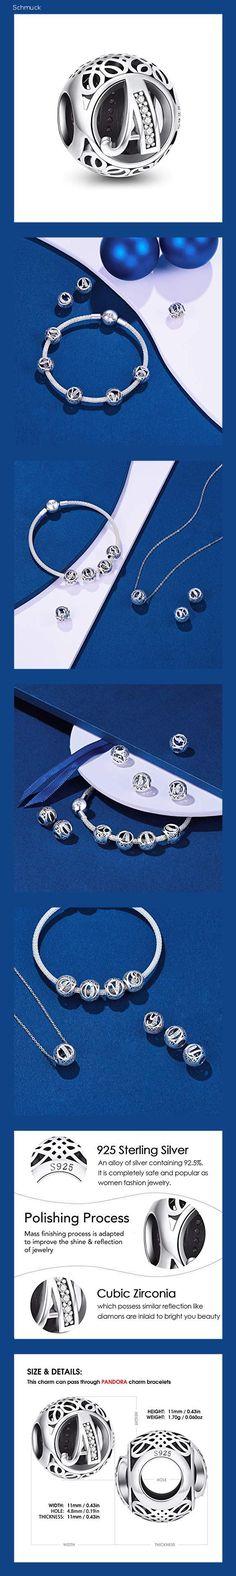 NINGAN Charm-Anhänger, 925 Sterlingsilber, Motiv: Buchstabe des Alphabets, für Armbänder, kompatibel mit europäischen Armbändern (Buchstabe A) - 14g6